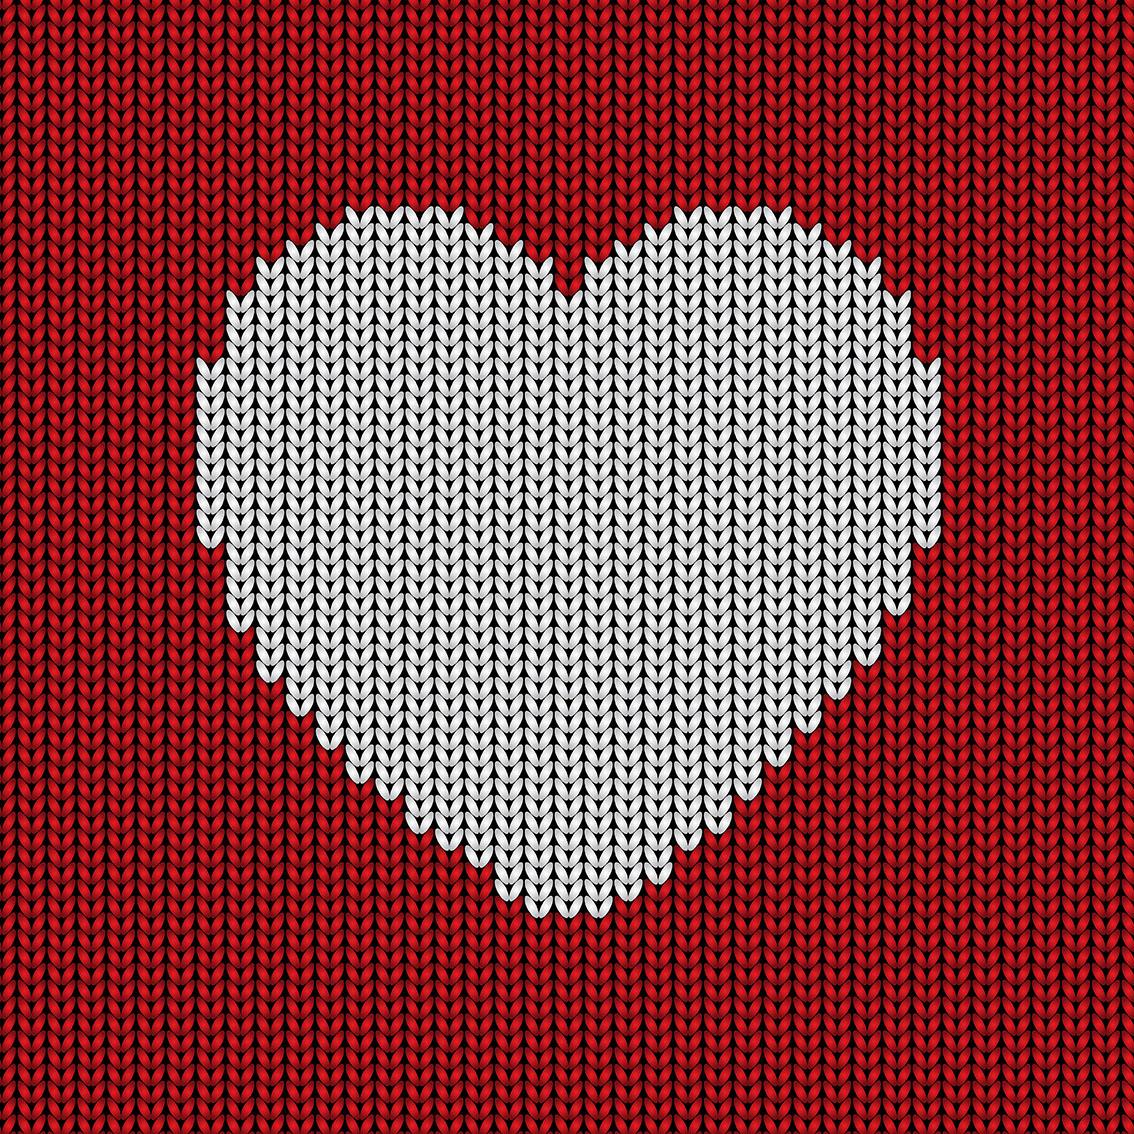 Knitted heart background - Descargue Gráficos y Vectores Gratis